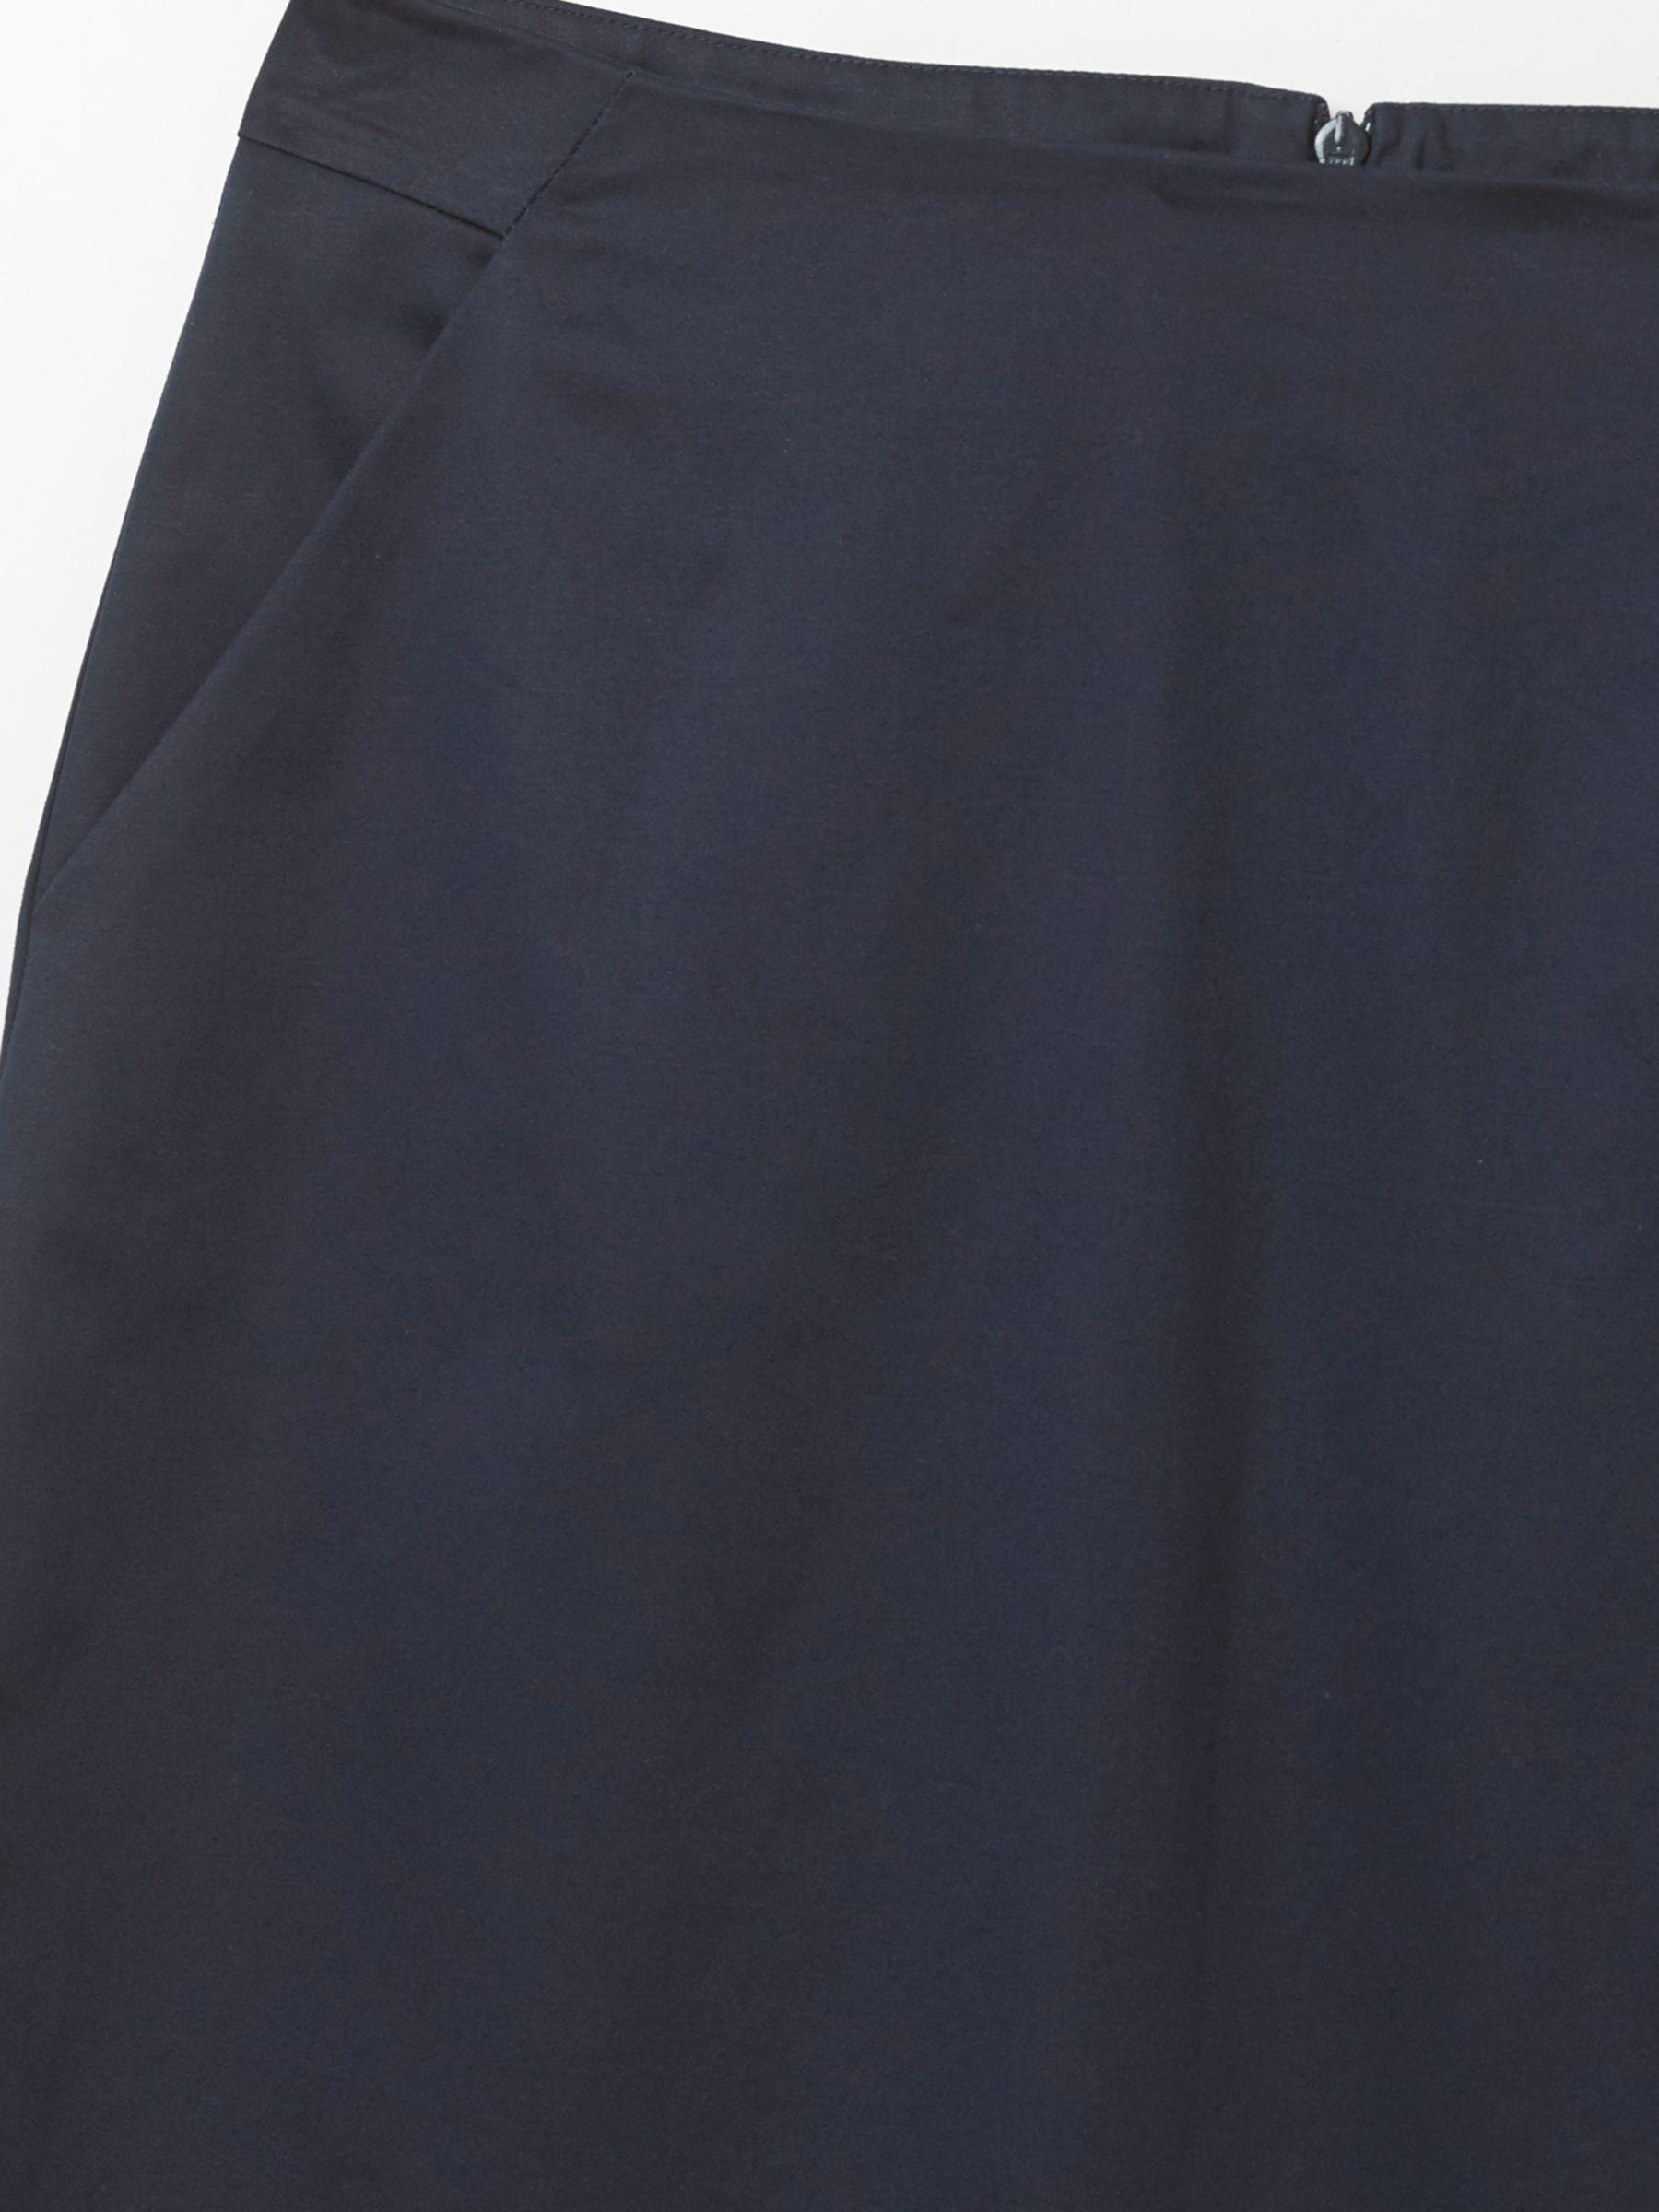 White Stuff Cotton Sara Sateen Skirt in Navy (Blue)